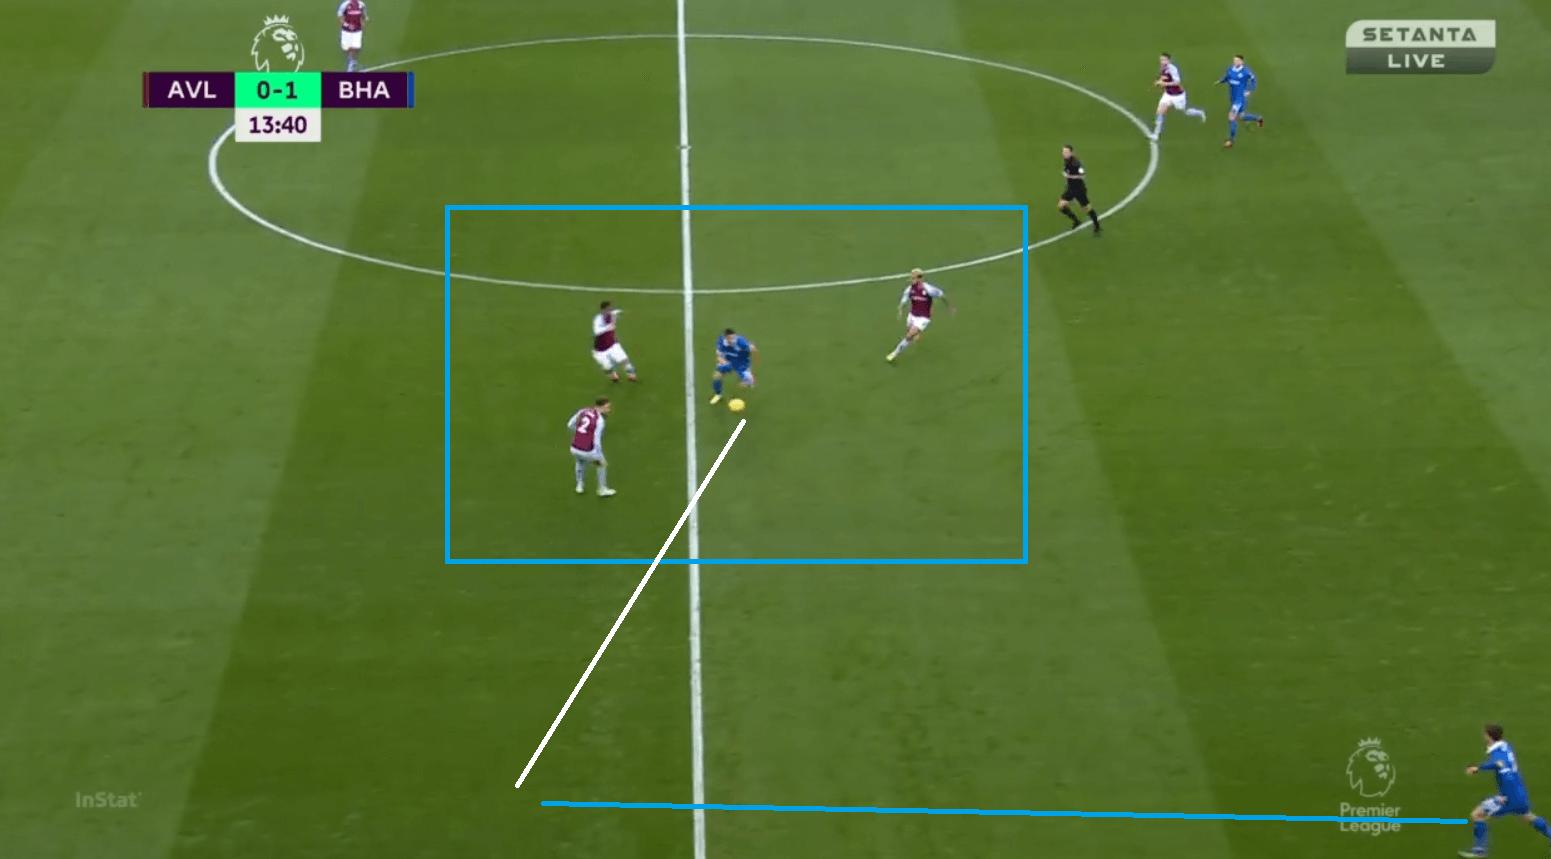 Premier League 2020/21: Aston Villa vs Brighton - tactical analysis - tactics